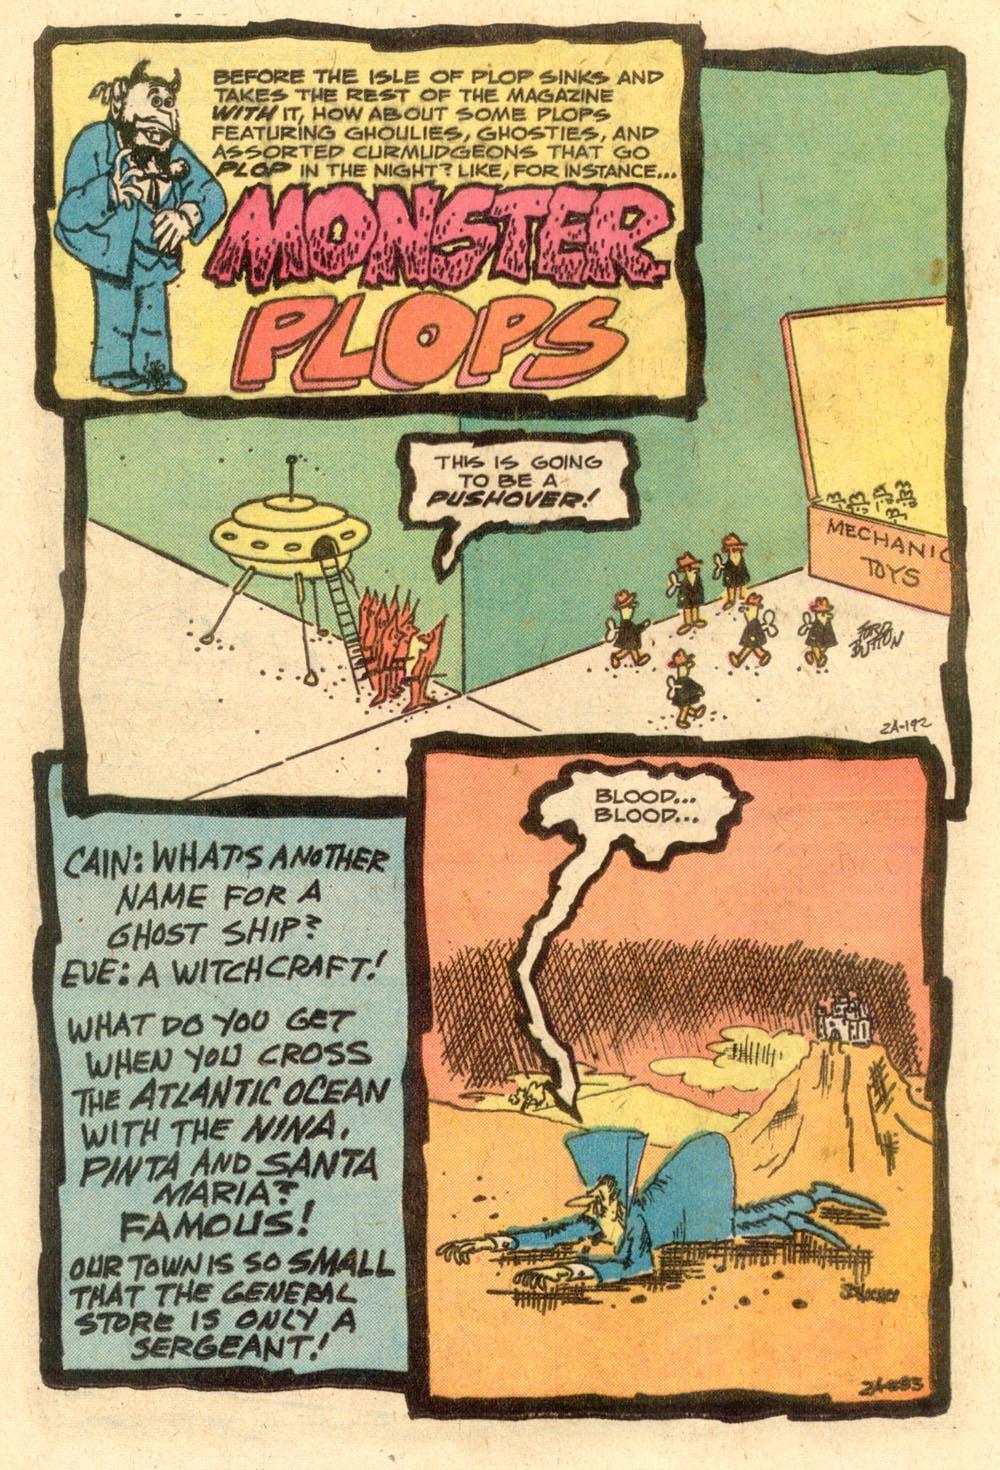 Read online Plop! comic -  Issue #24 - 24